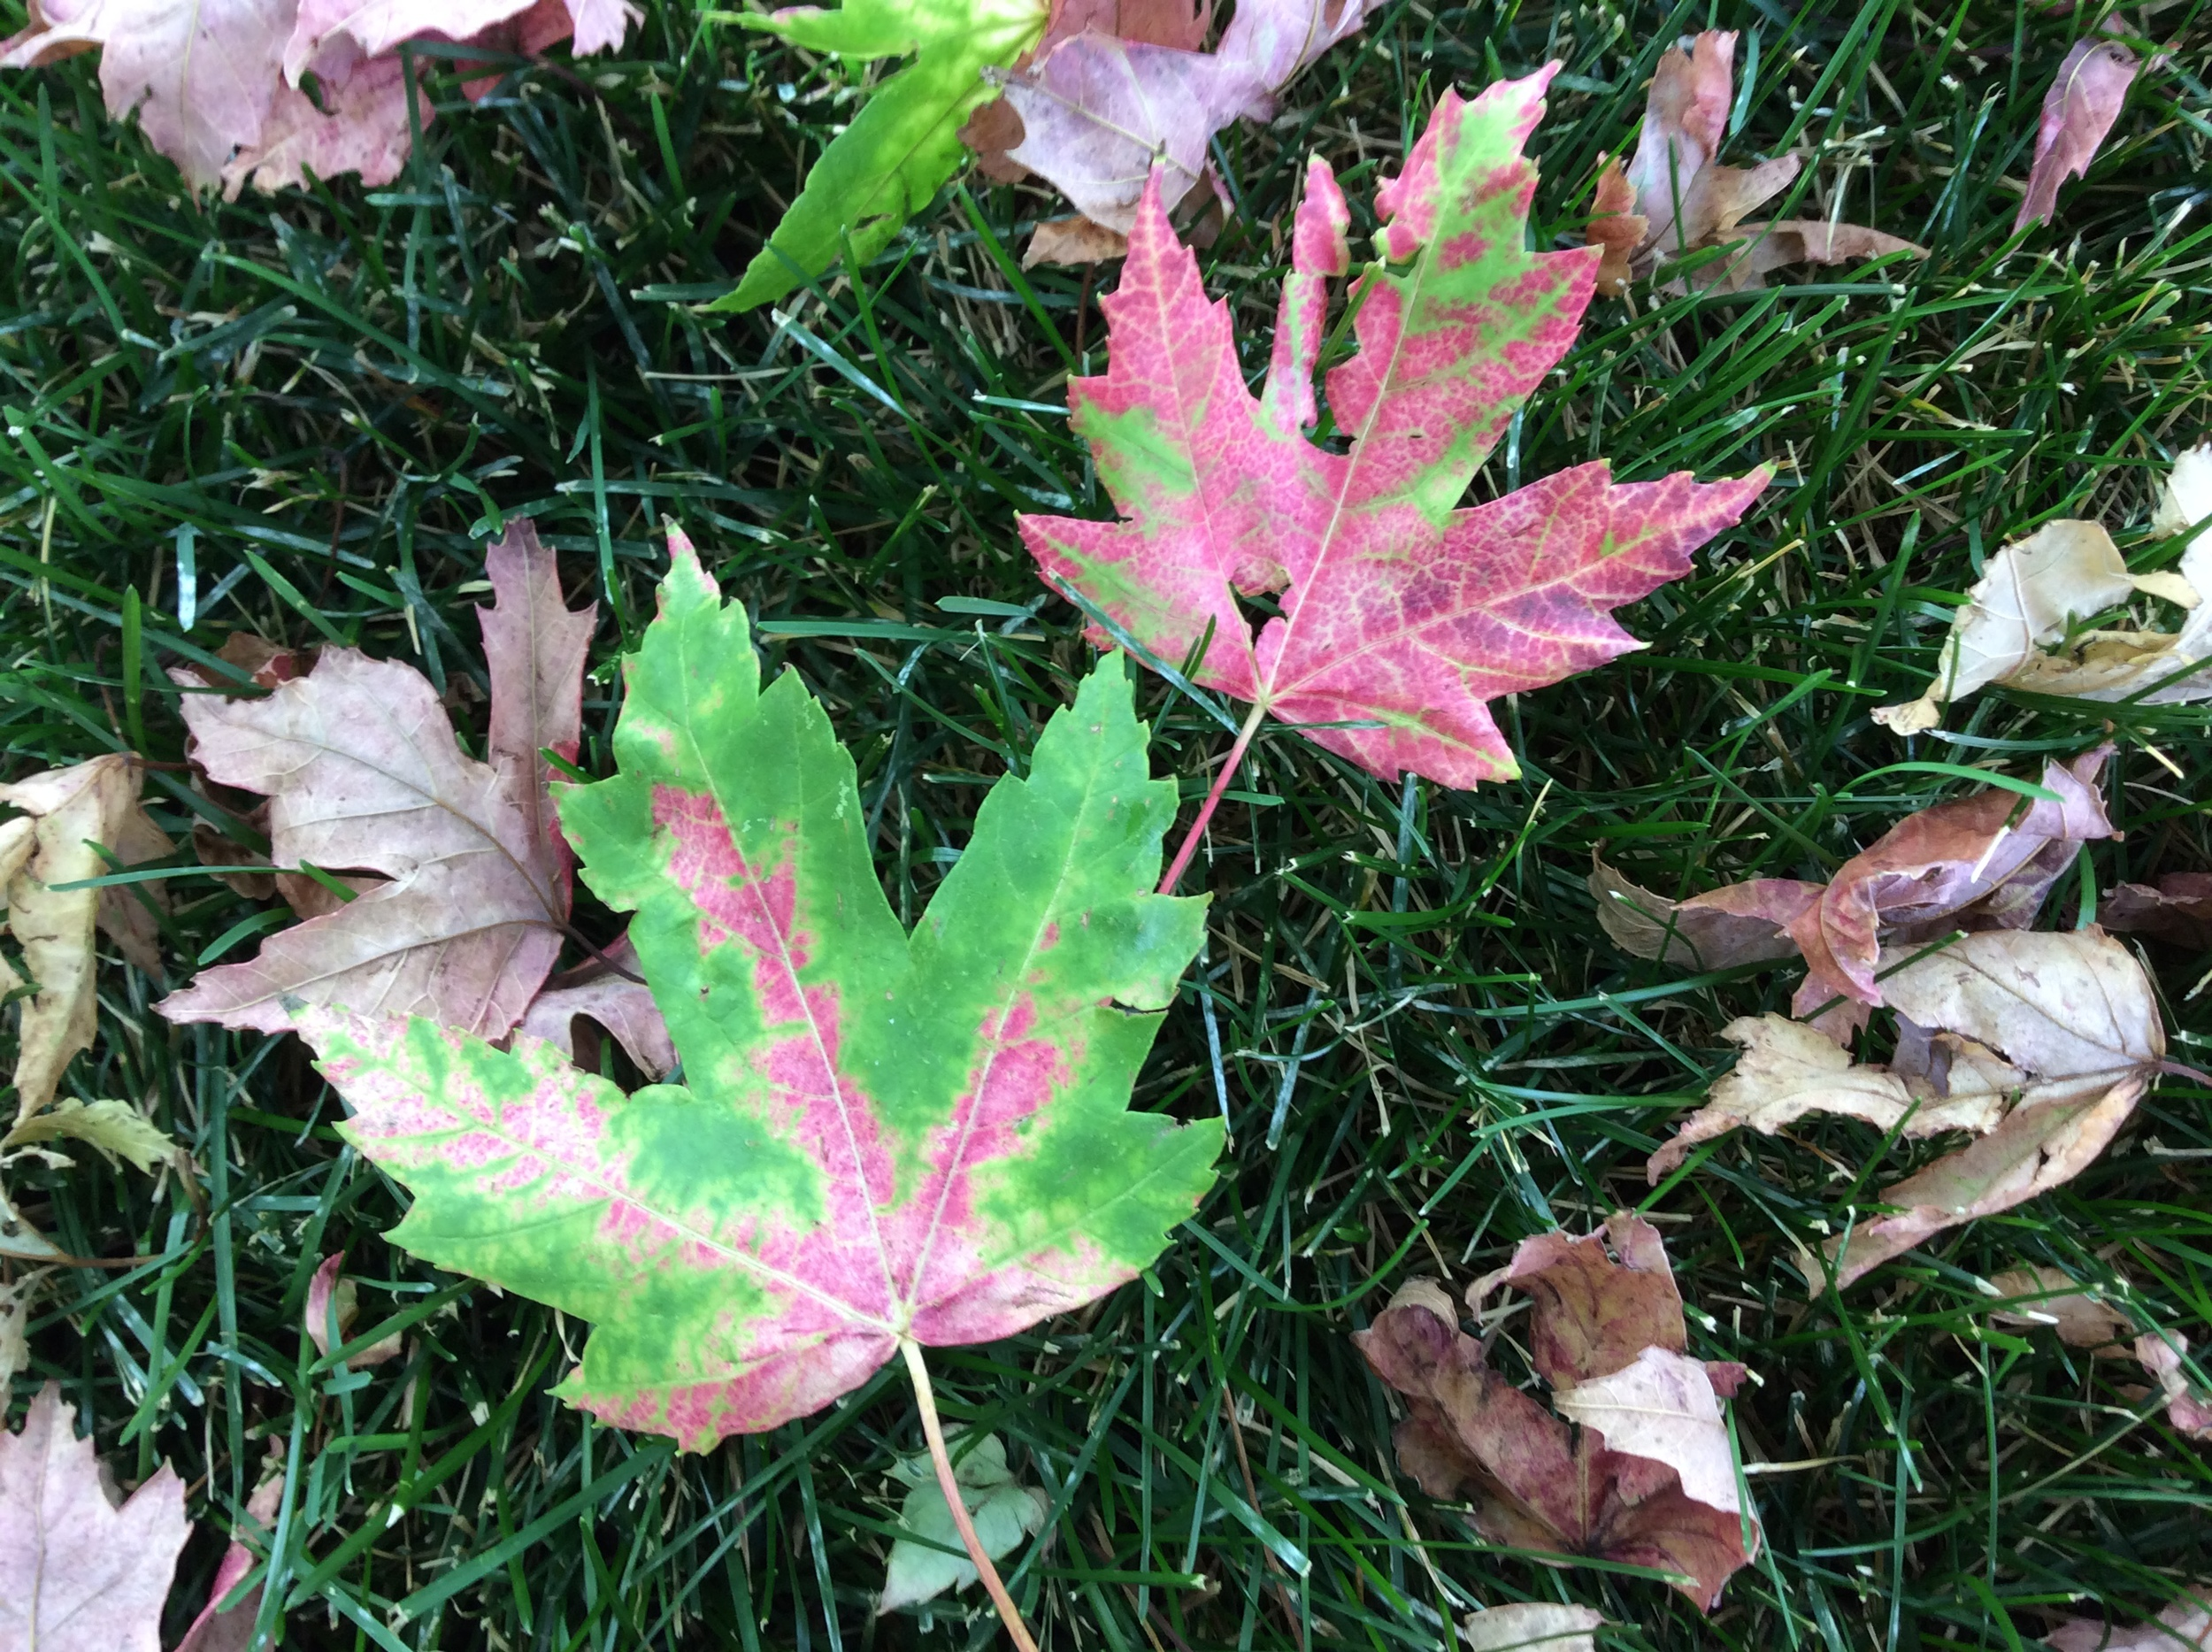 It is starting to look like fall in my backyard!